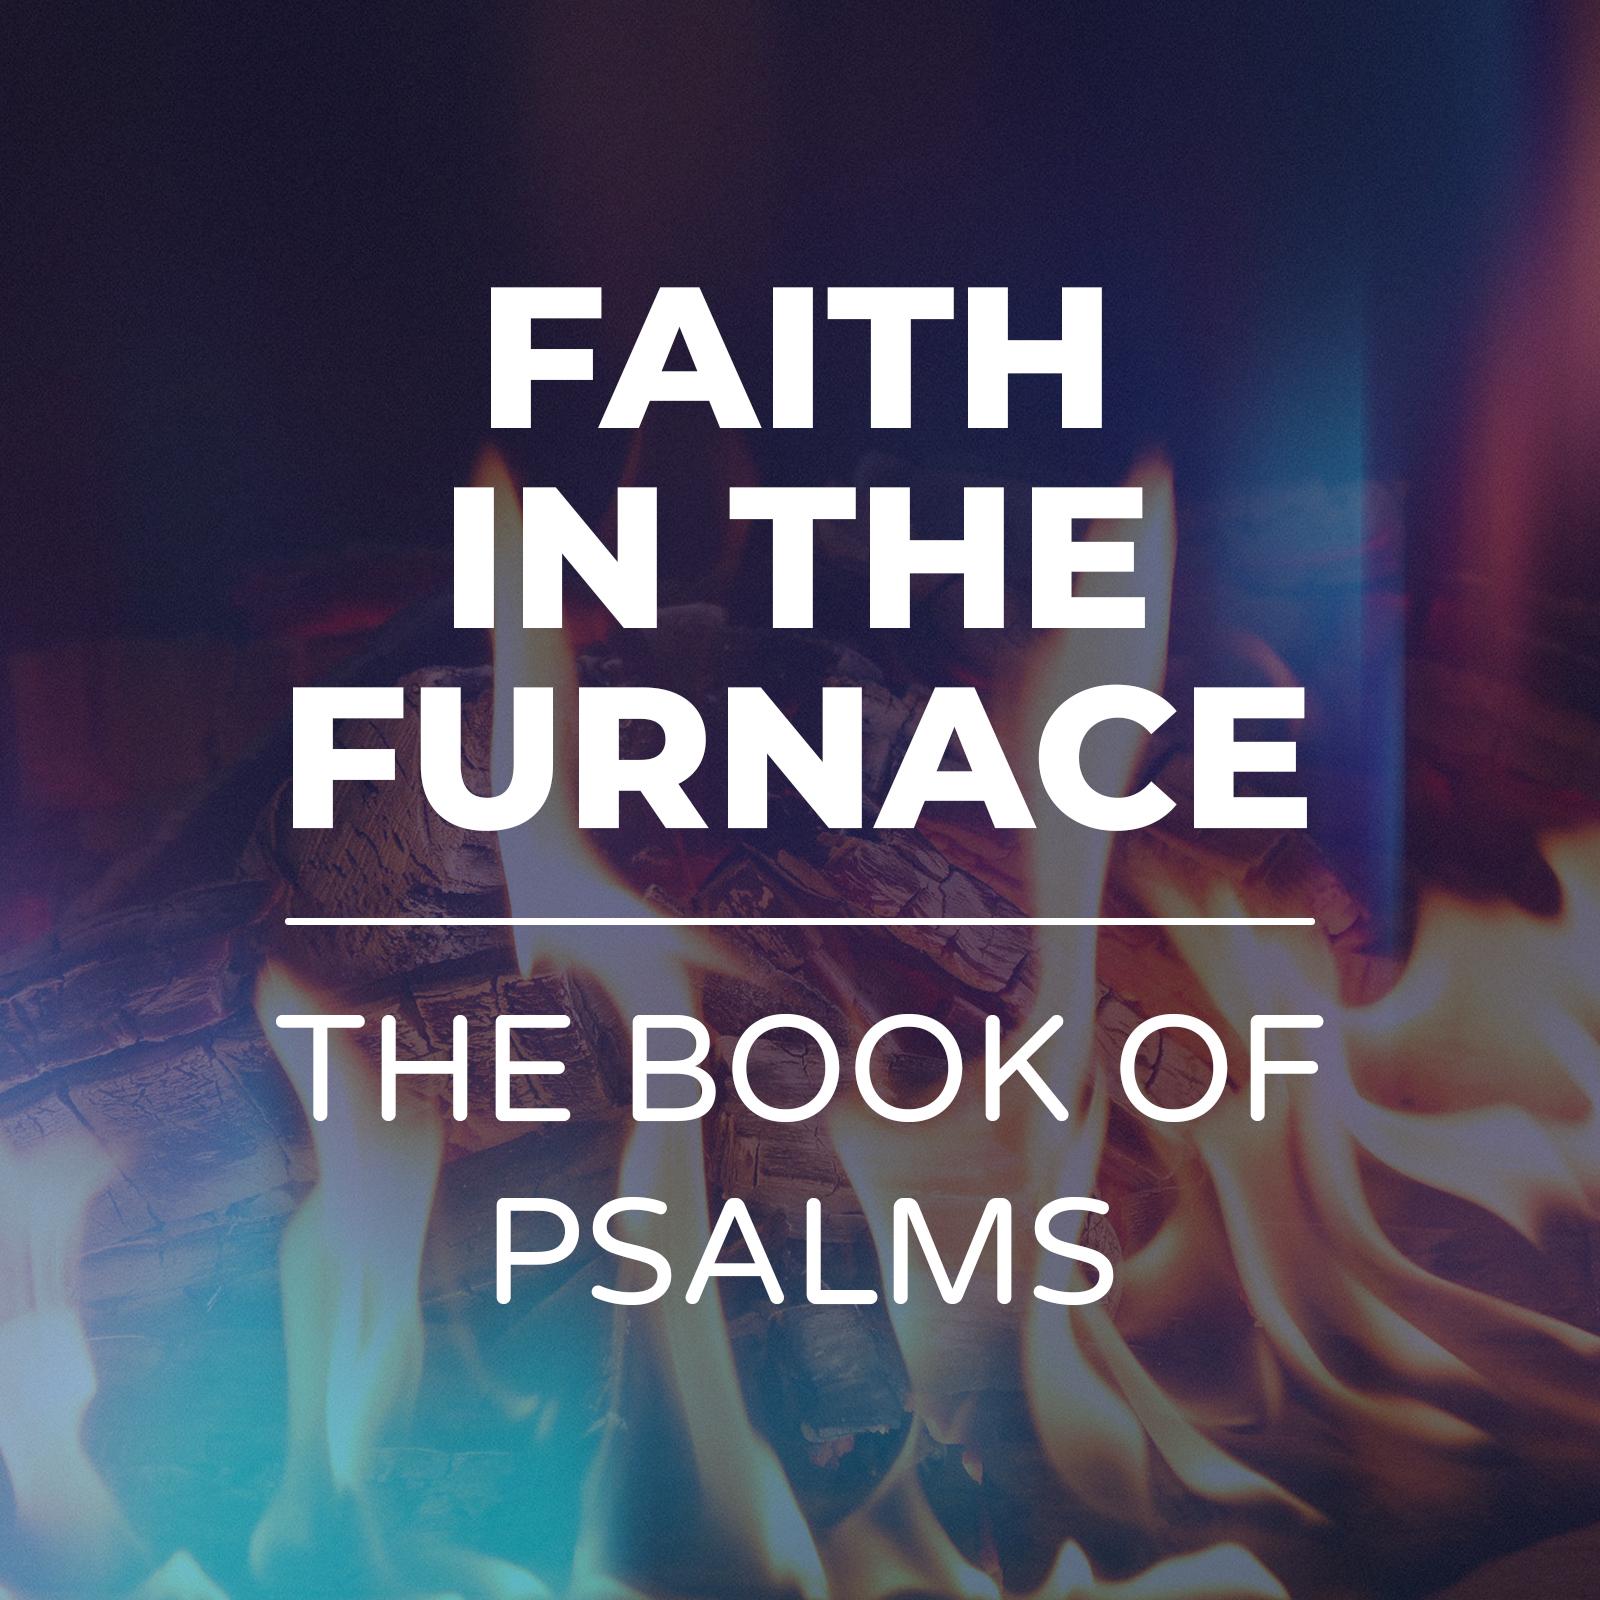 Faith in the furnace - The Book of Psalms - Hope Church Huddersfield Sermon Series